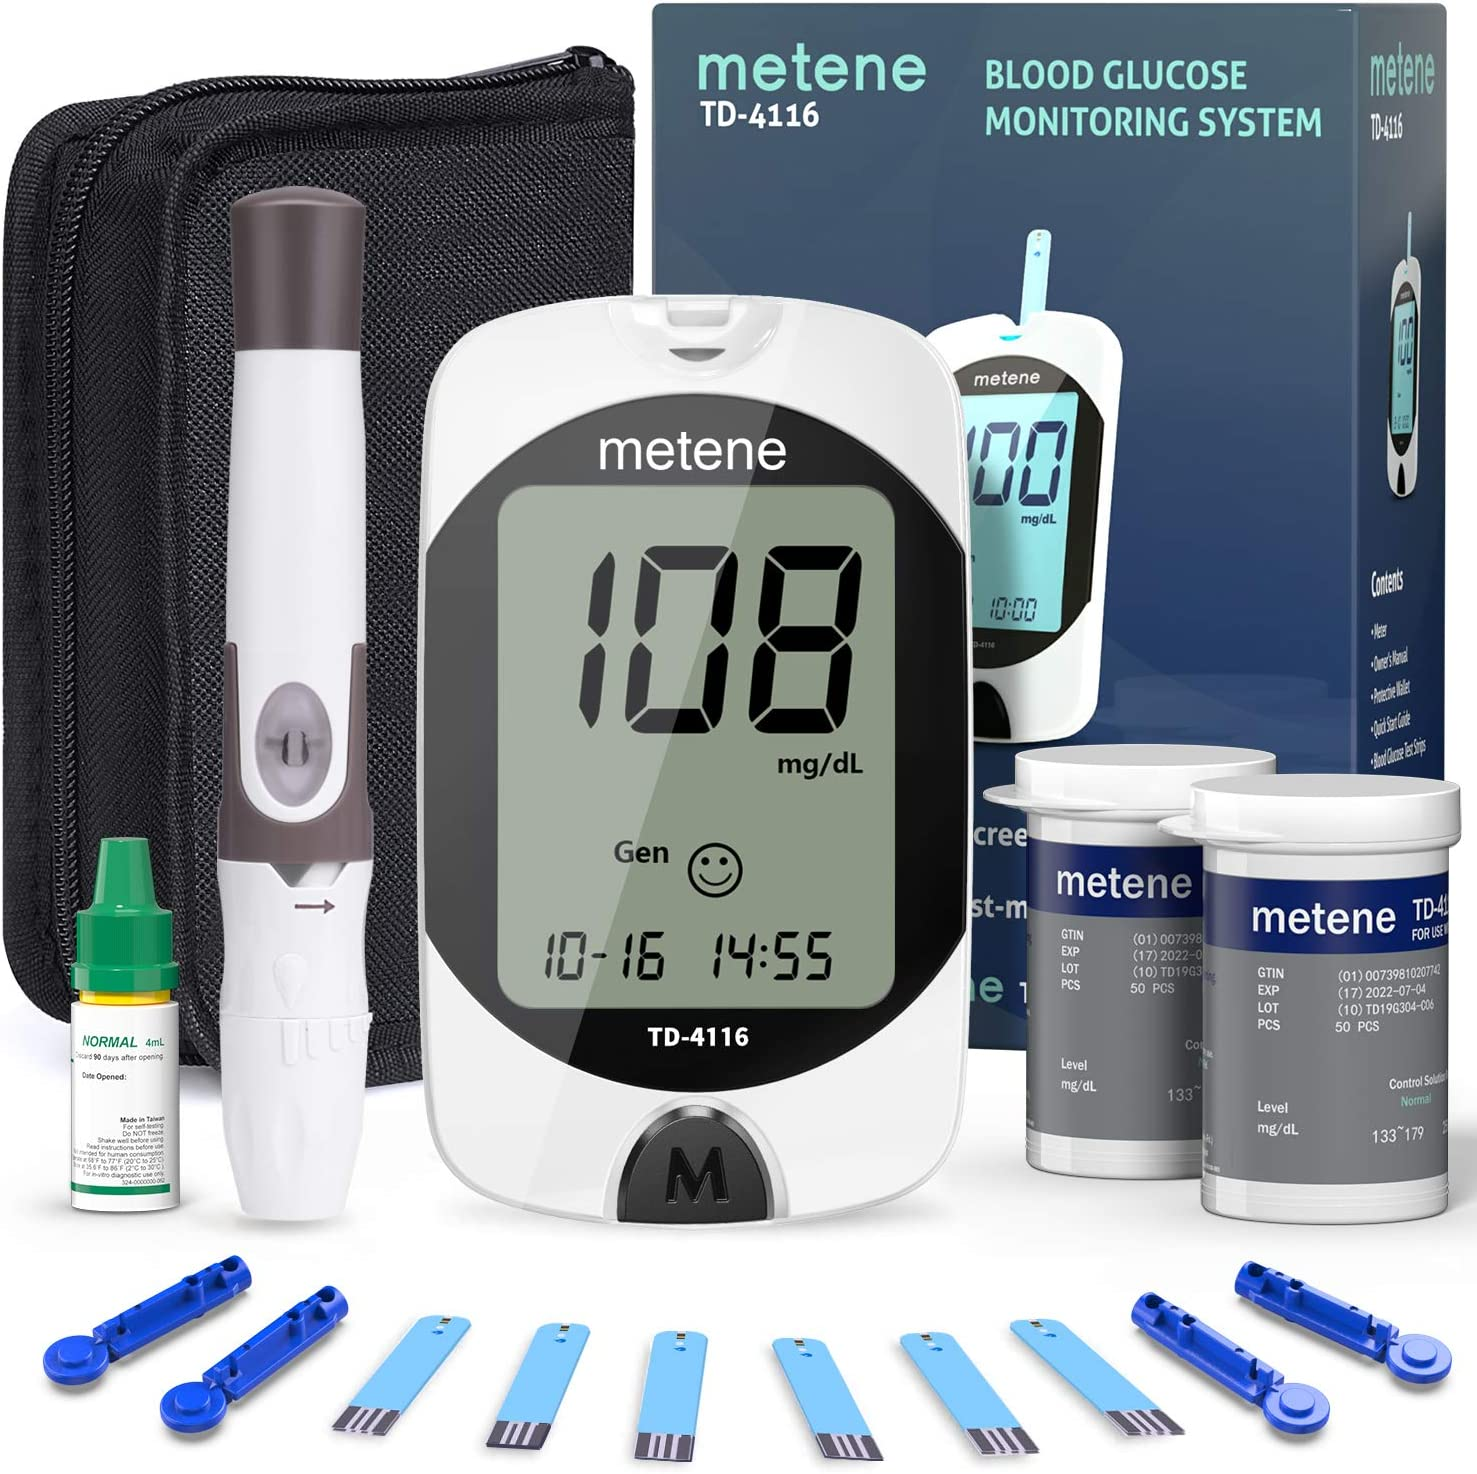 Blood Glucose Monitor Kit, 100 Glucometer Strips, 100 Lancets, 1 Blood Sugar Monitor, 1 Lancing Device and 1 Control Solution, metene TD-4116 Blood Sugar Test Kit, No Coding